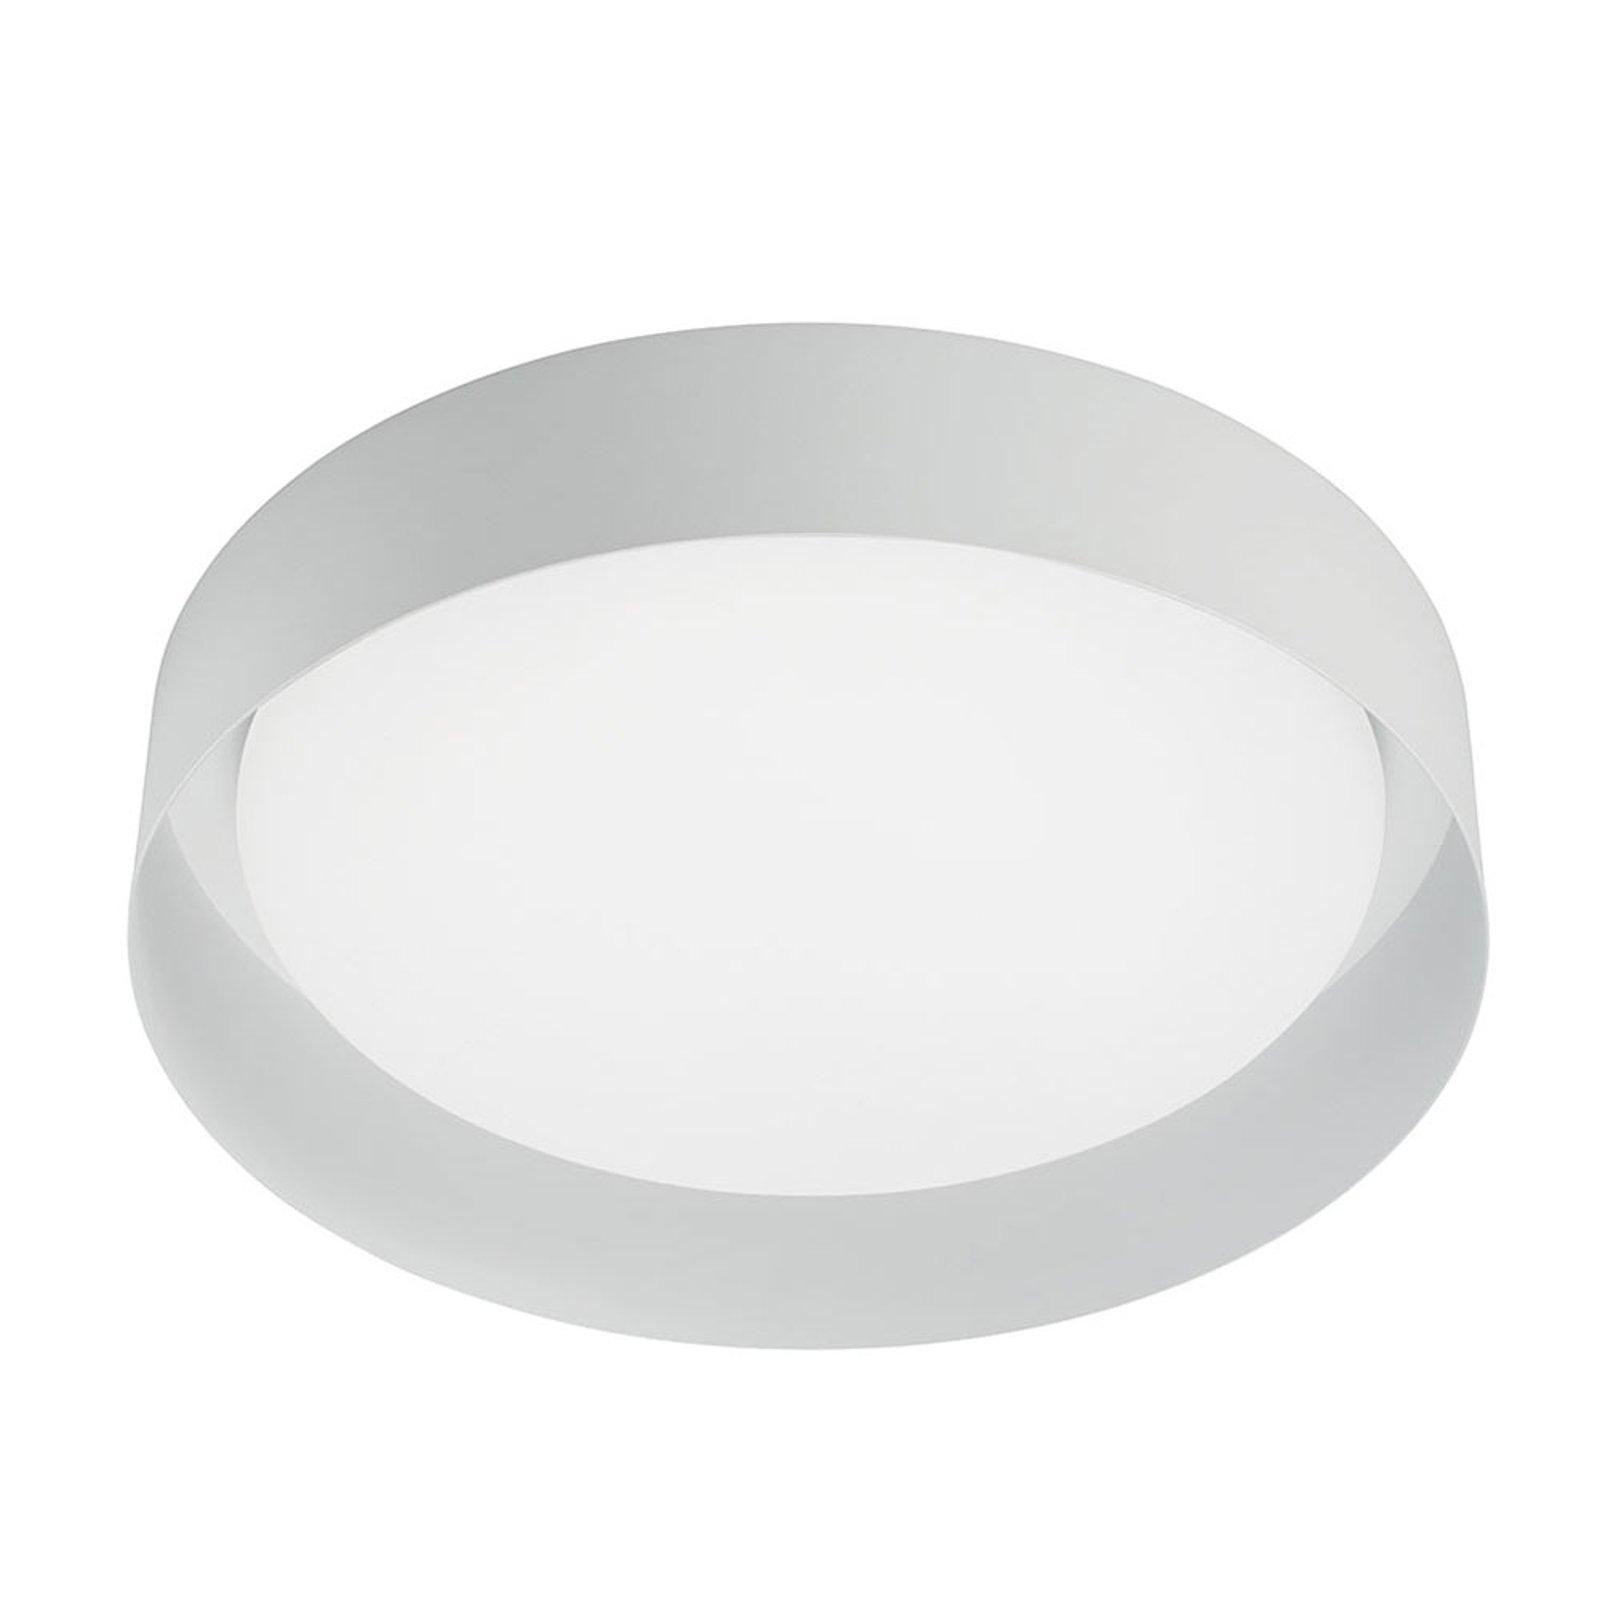 Crew 2 LED-taklampe, Ø 26 cm, hvit